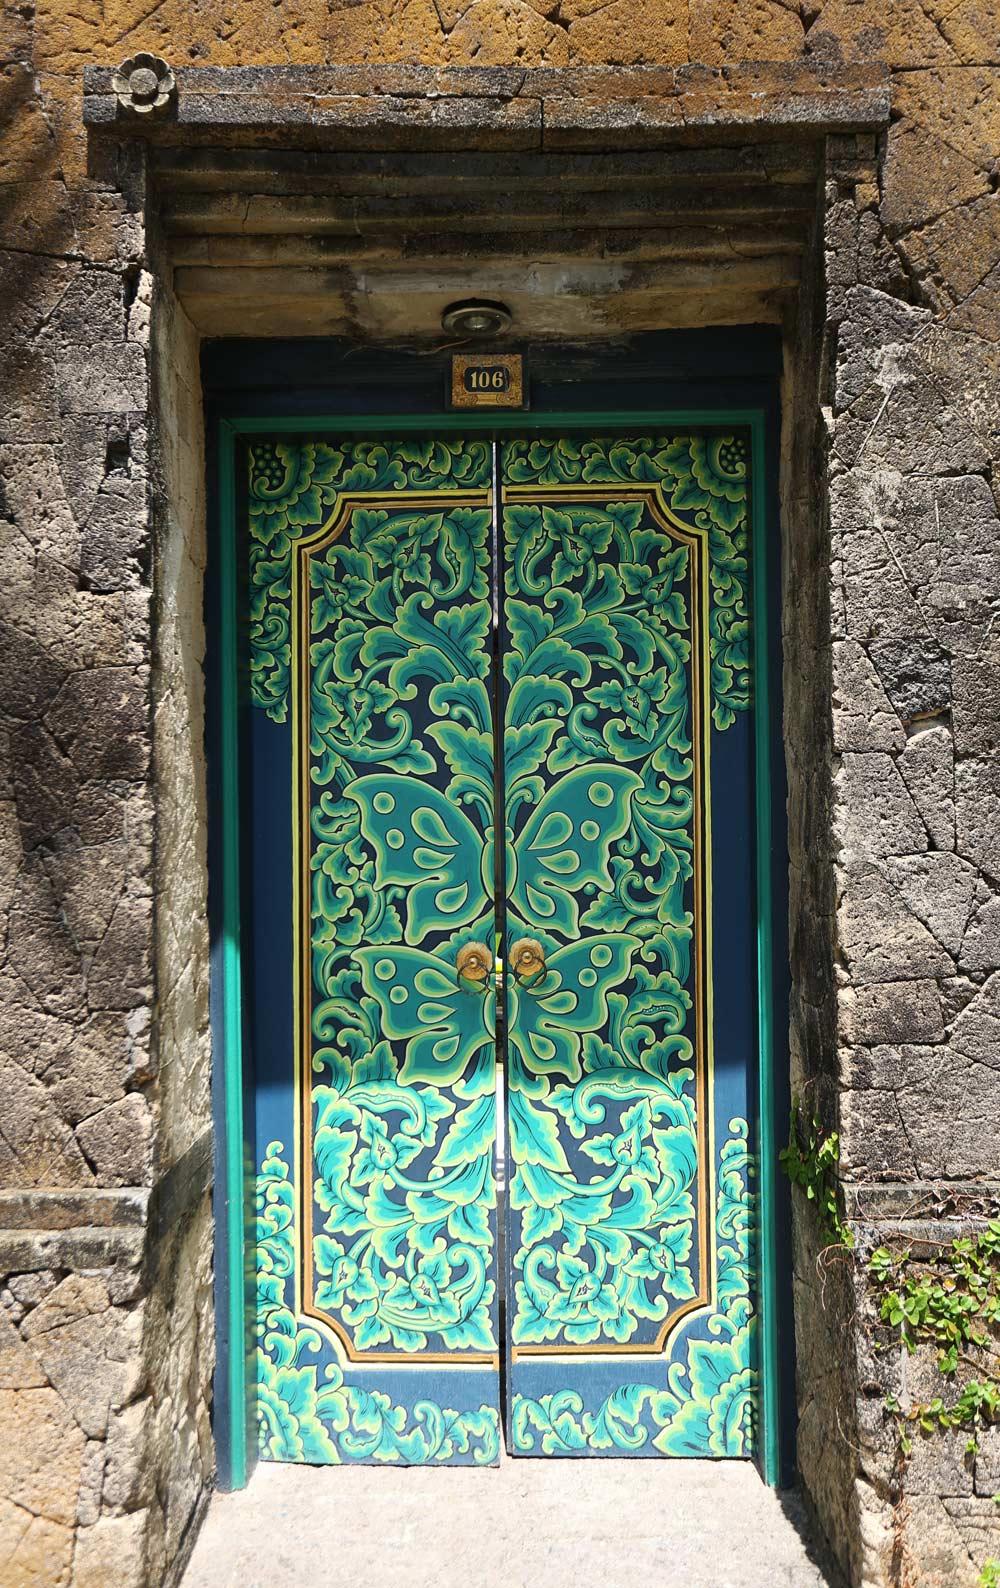 Bali-Photo-Diary-2012-2013.36